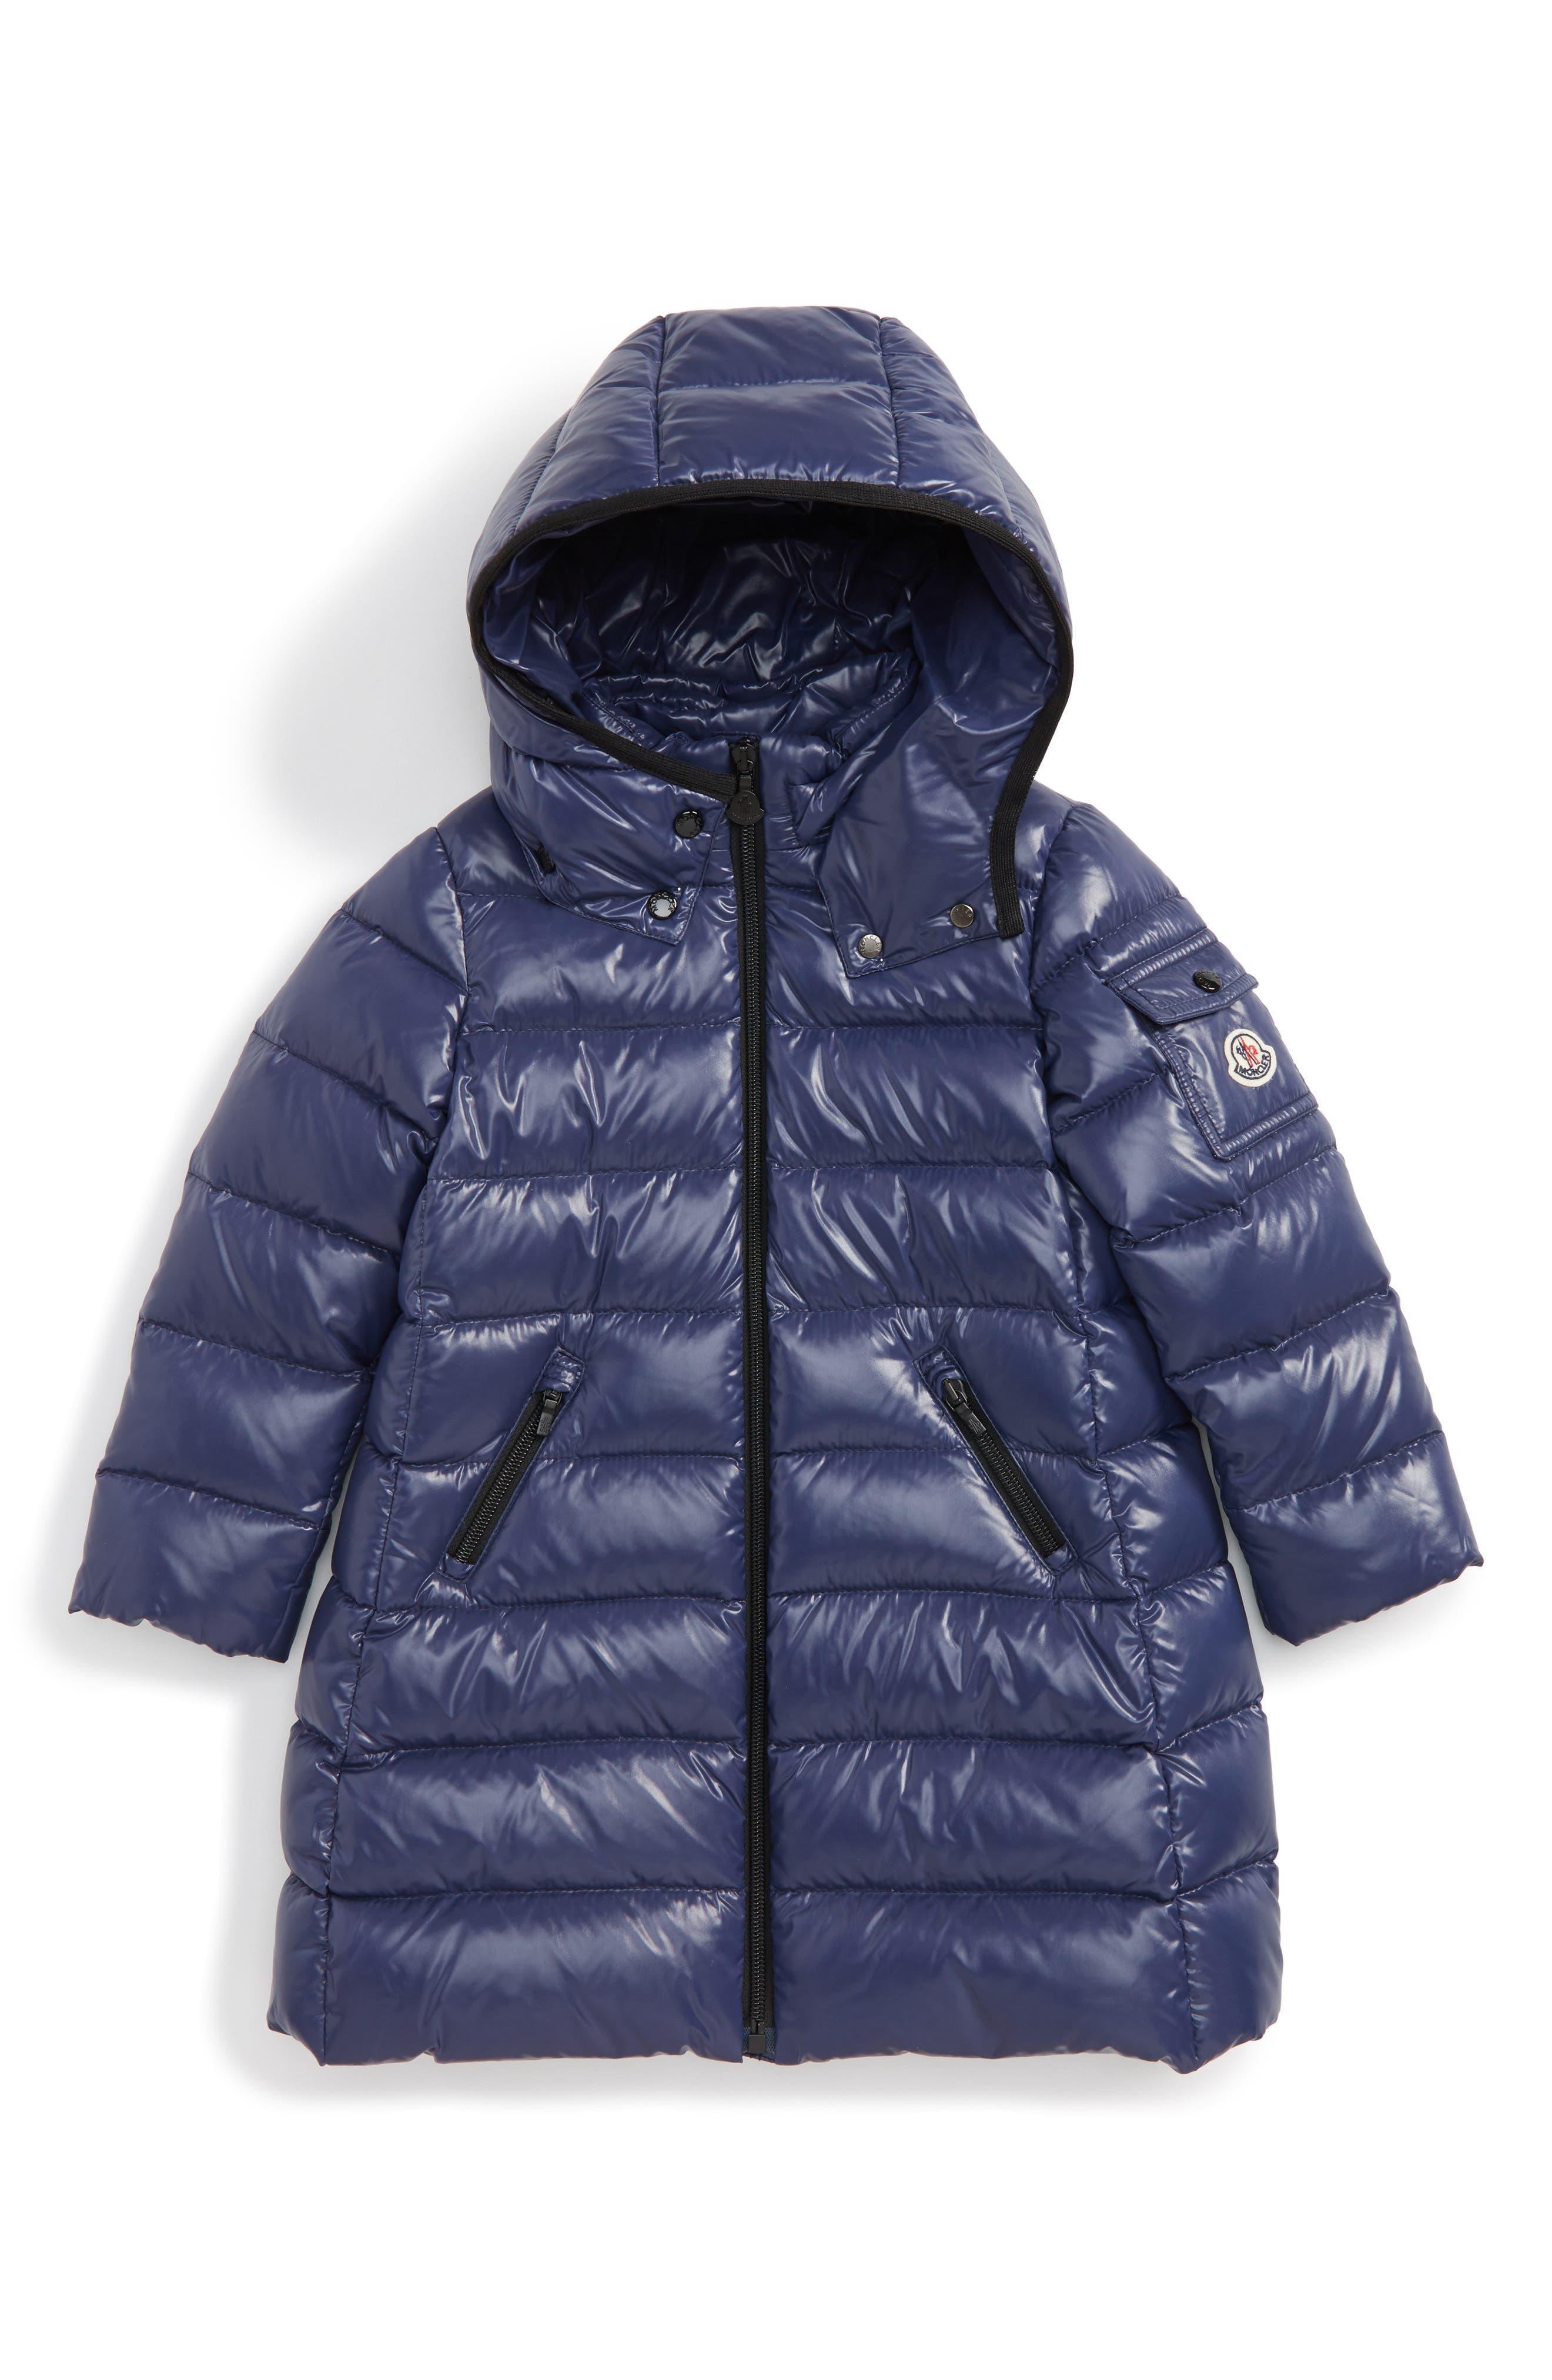 Moka Long Hooded Waterproof Down Jacket,                         Main,                         color, Navy